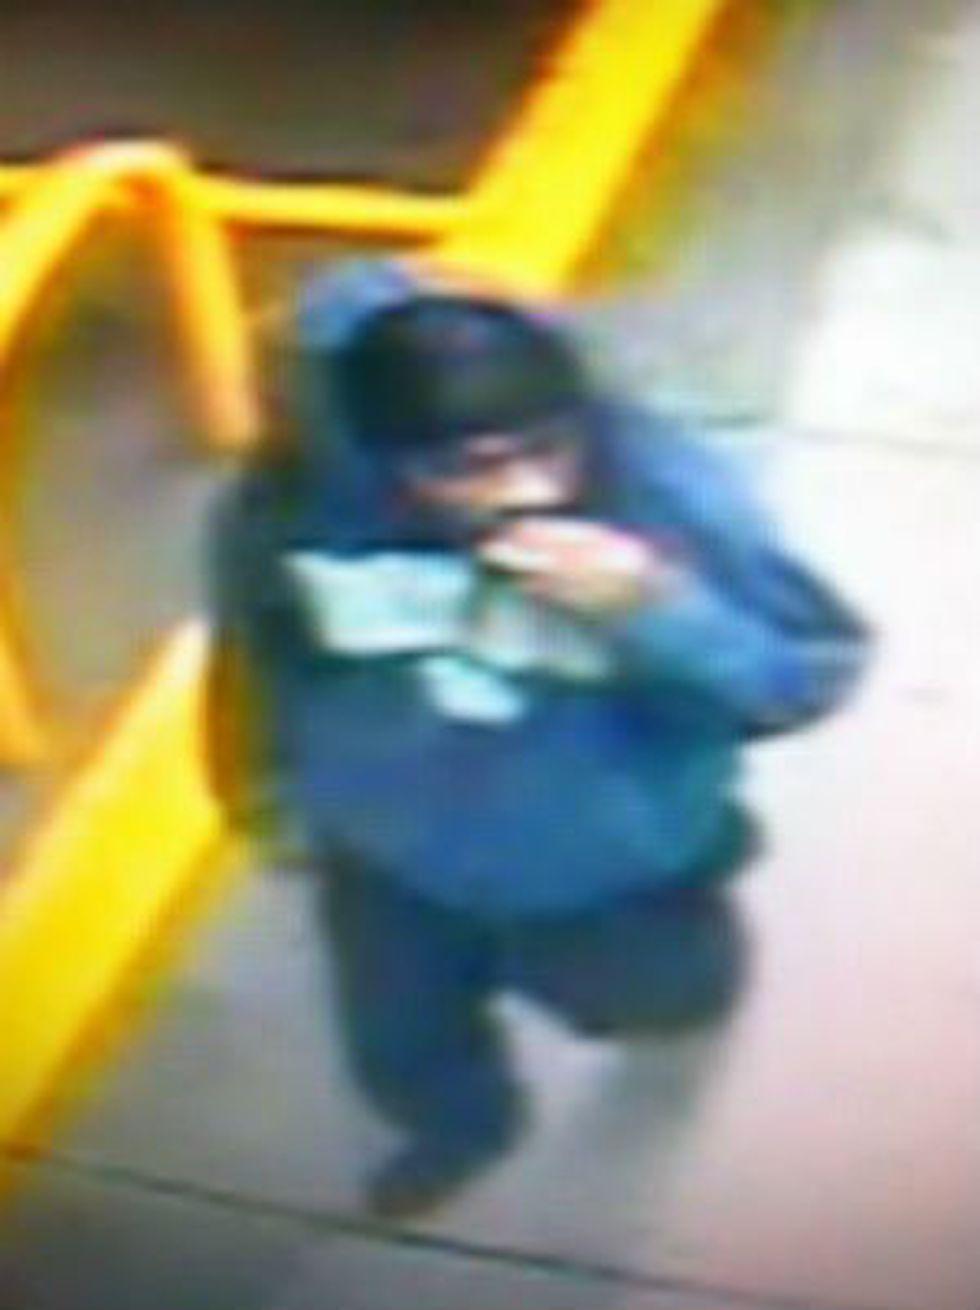 Video surveillance shows the suspect. (Source: NCPD)